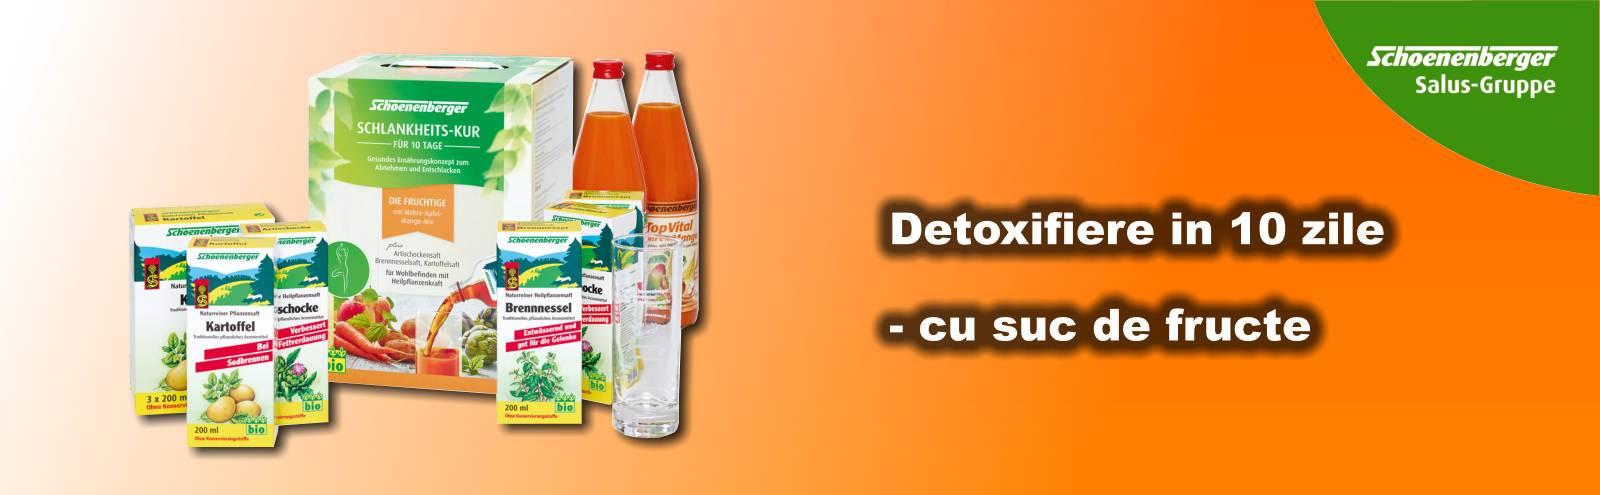 Cură de detoxifiere Schoenenberger TopVital (mango) [Pachet Dublu]